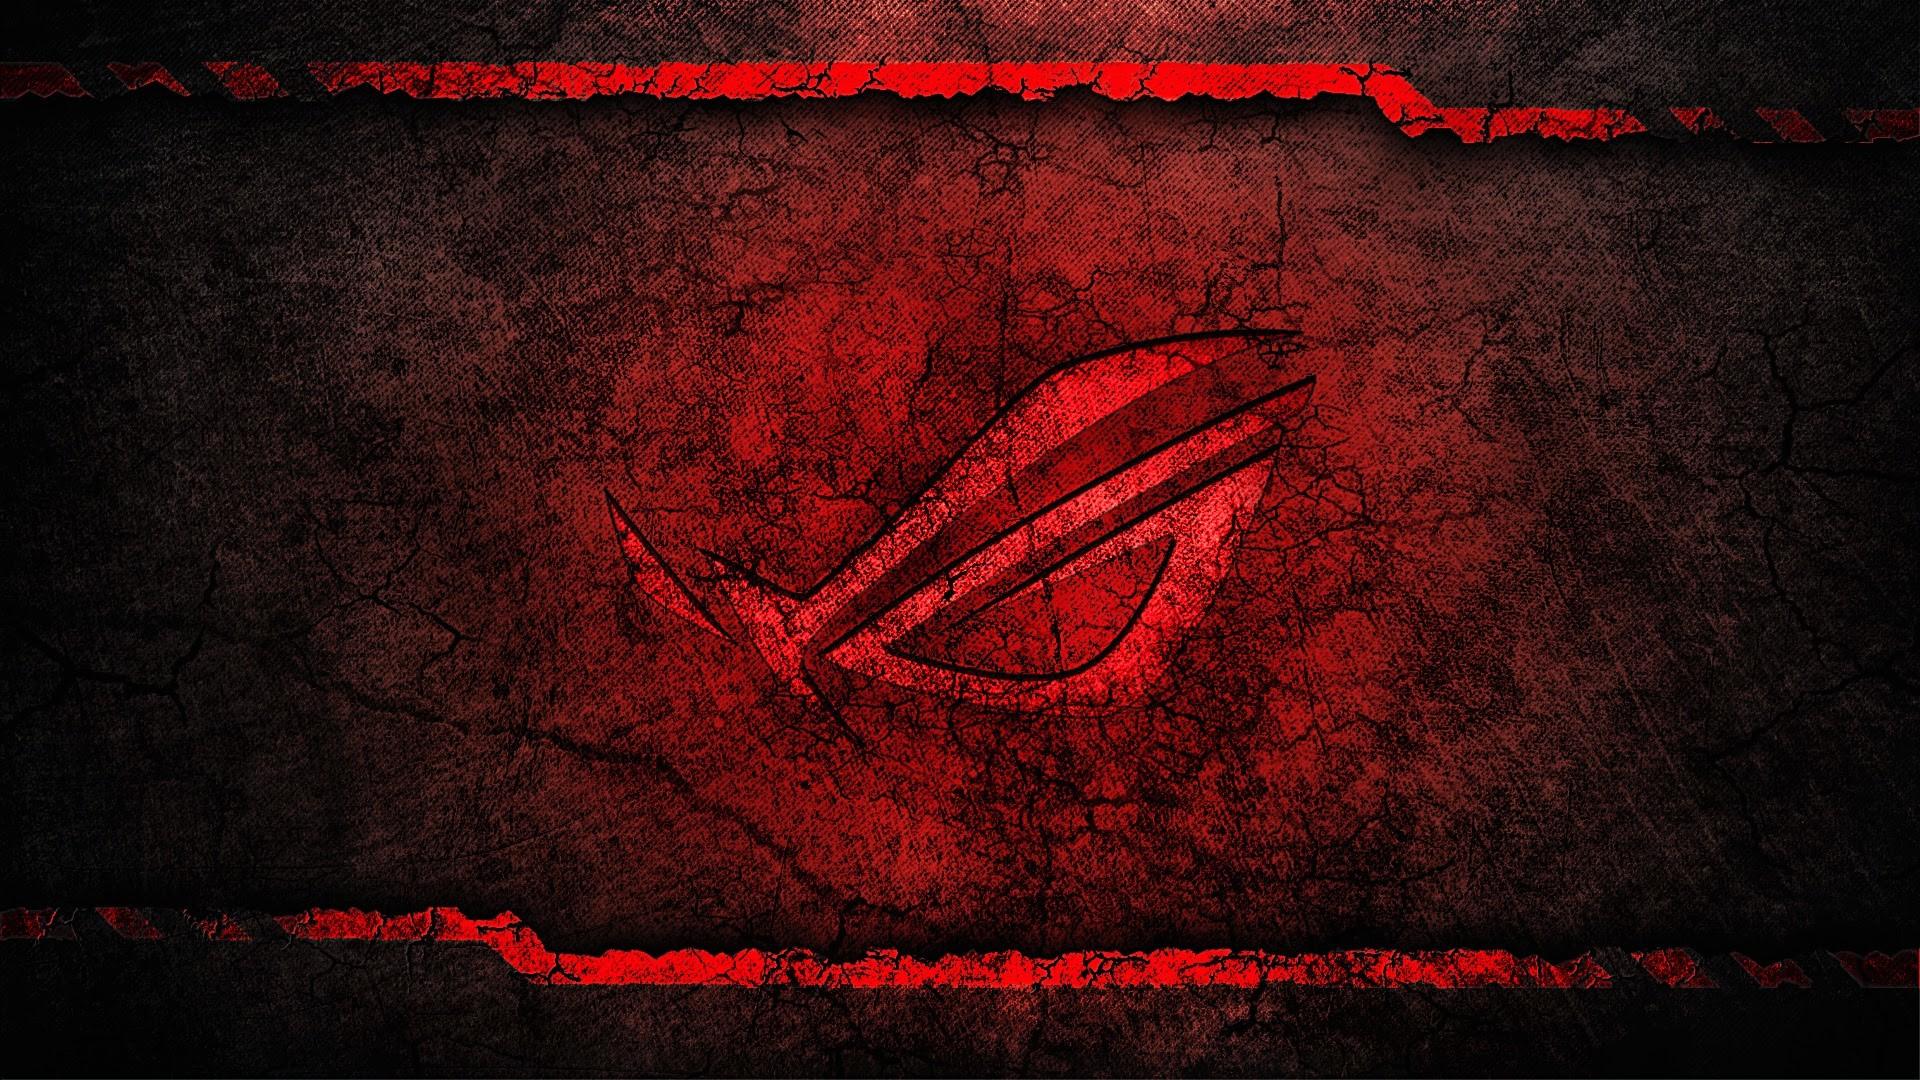 asus rog republic of gamers logo grunge background hd wallpaper .